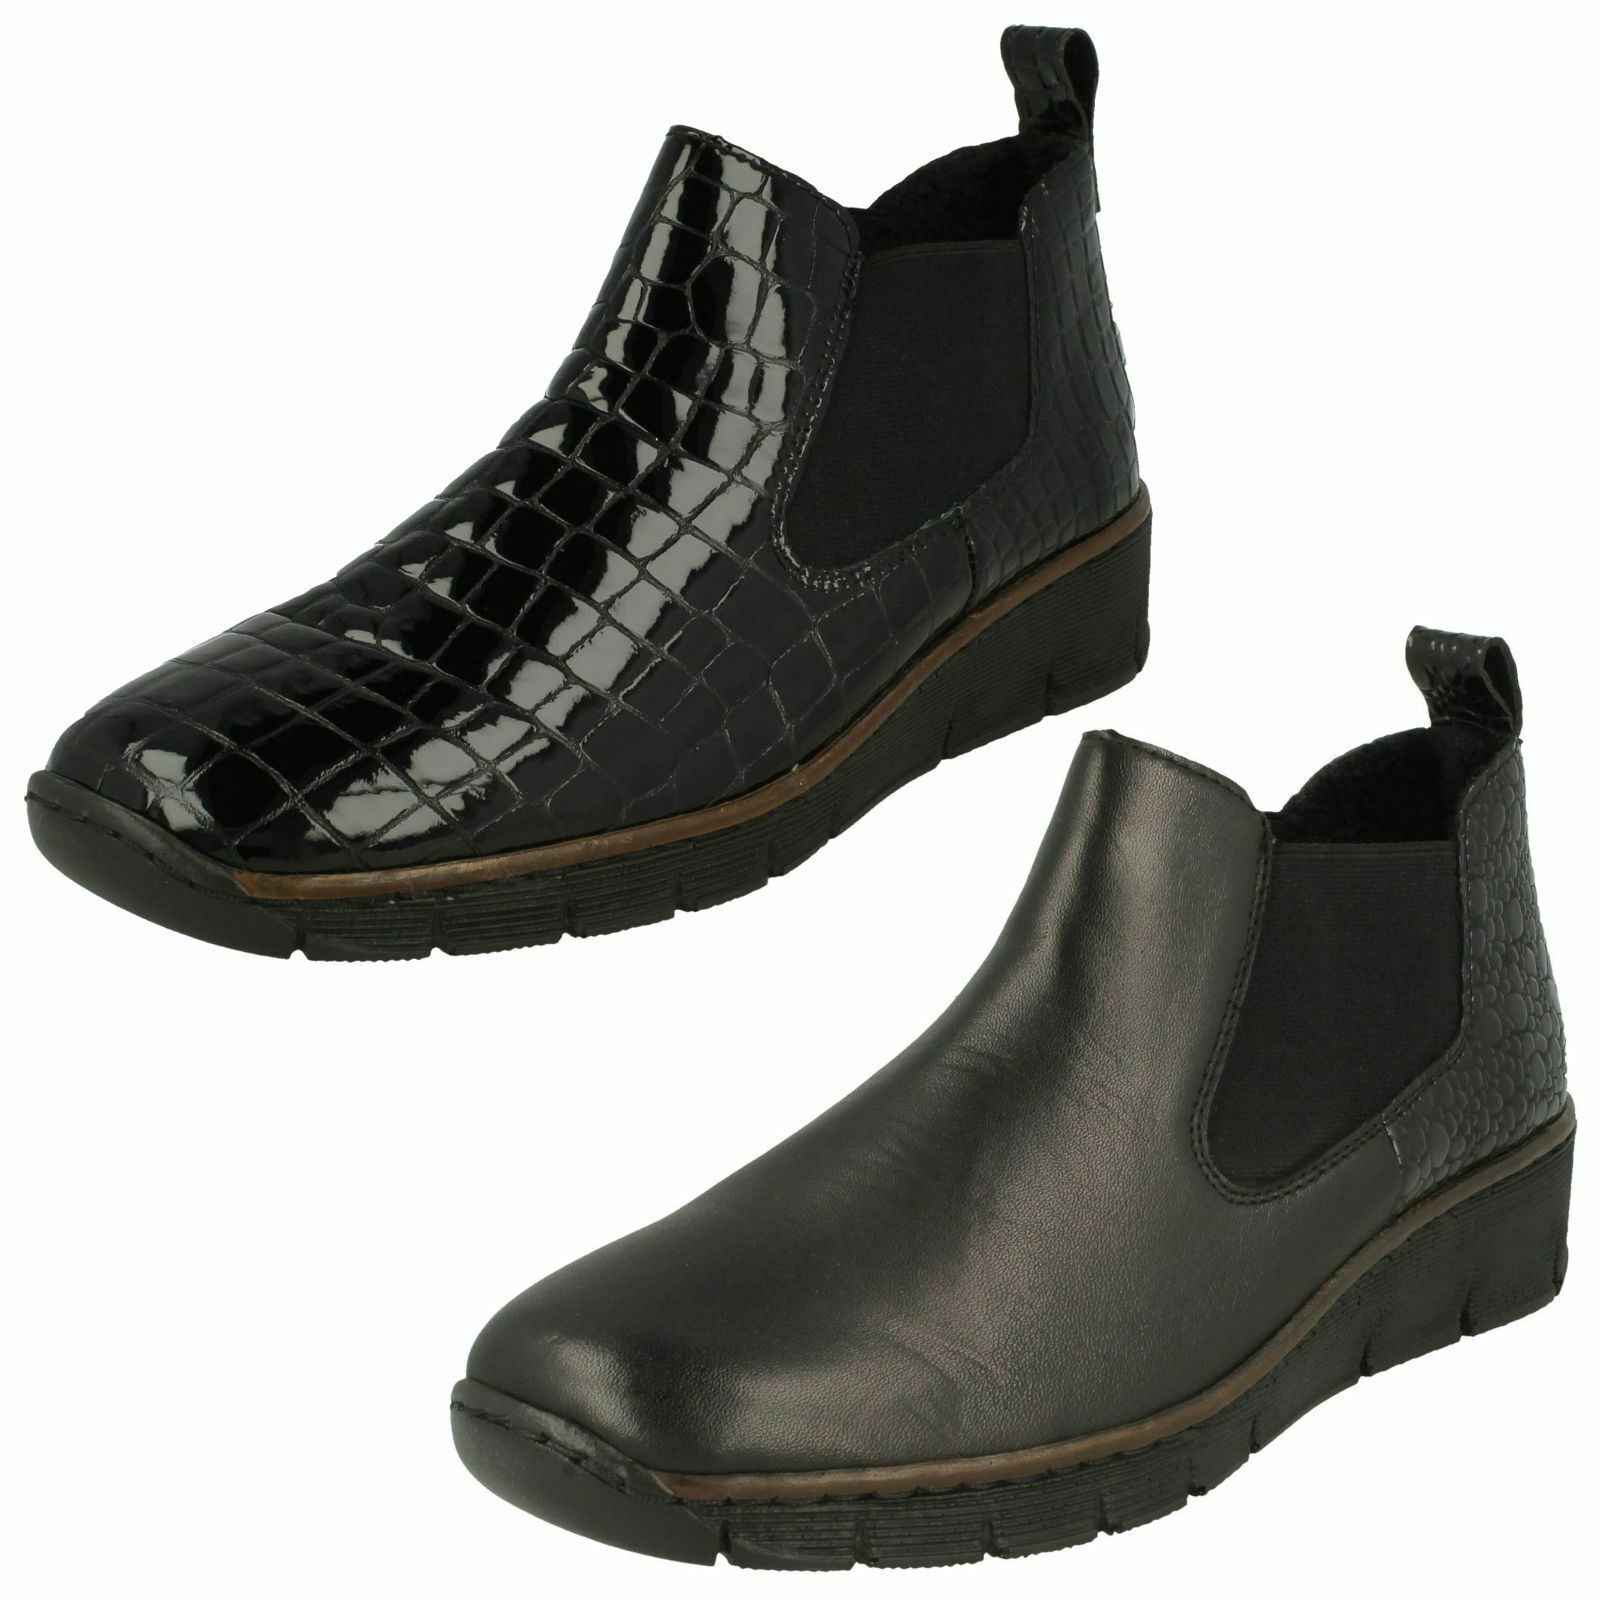 LADIES RIEKER schwarz PATENT LEATHER WEDGE LOW HEEL SLIP ON ANKLE Stiefel 53794